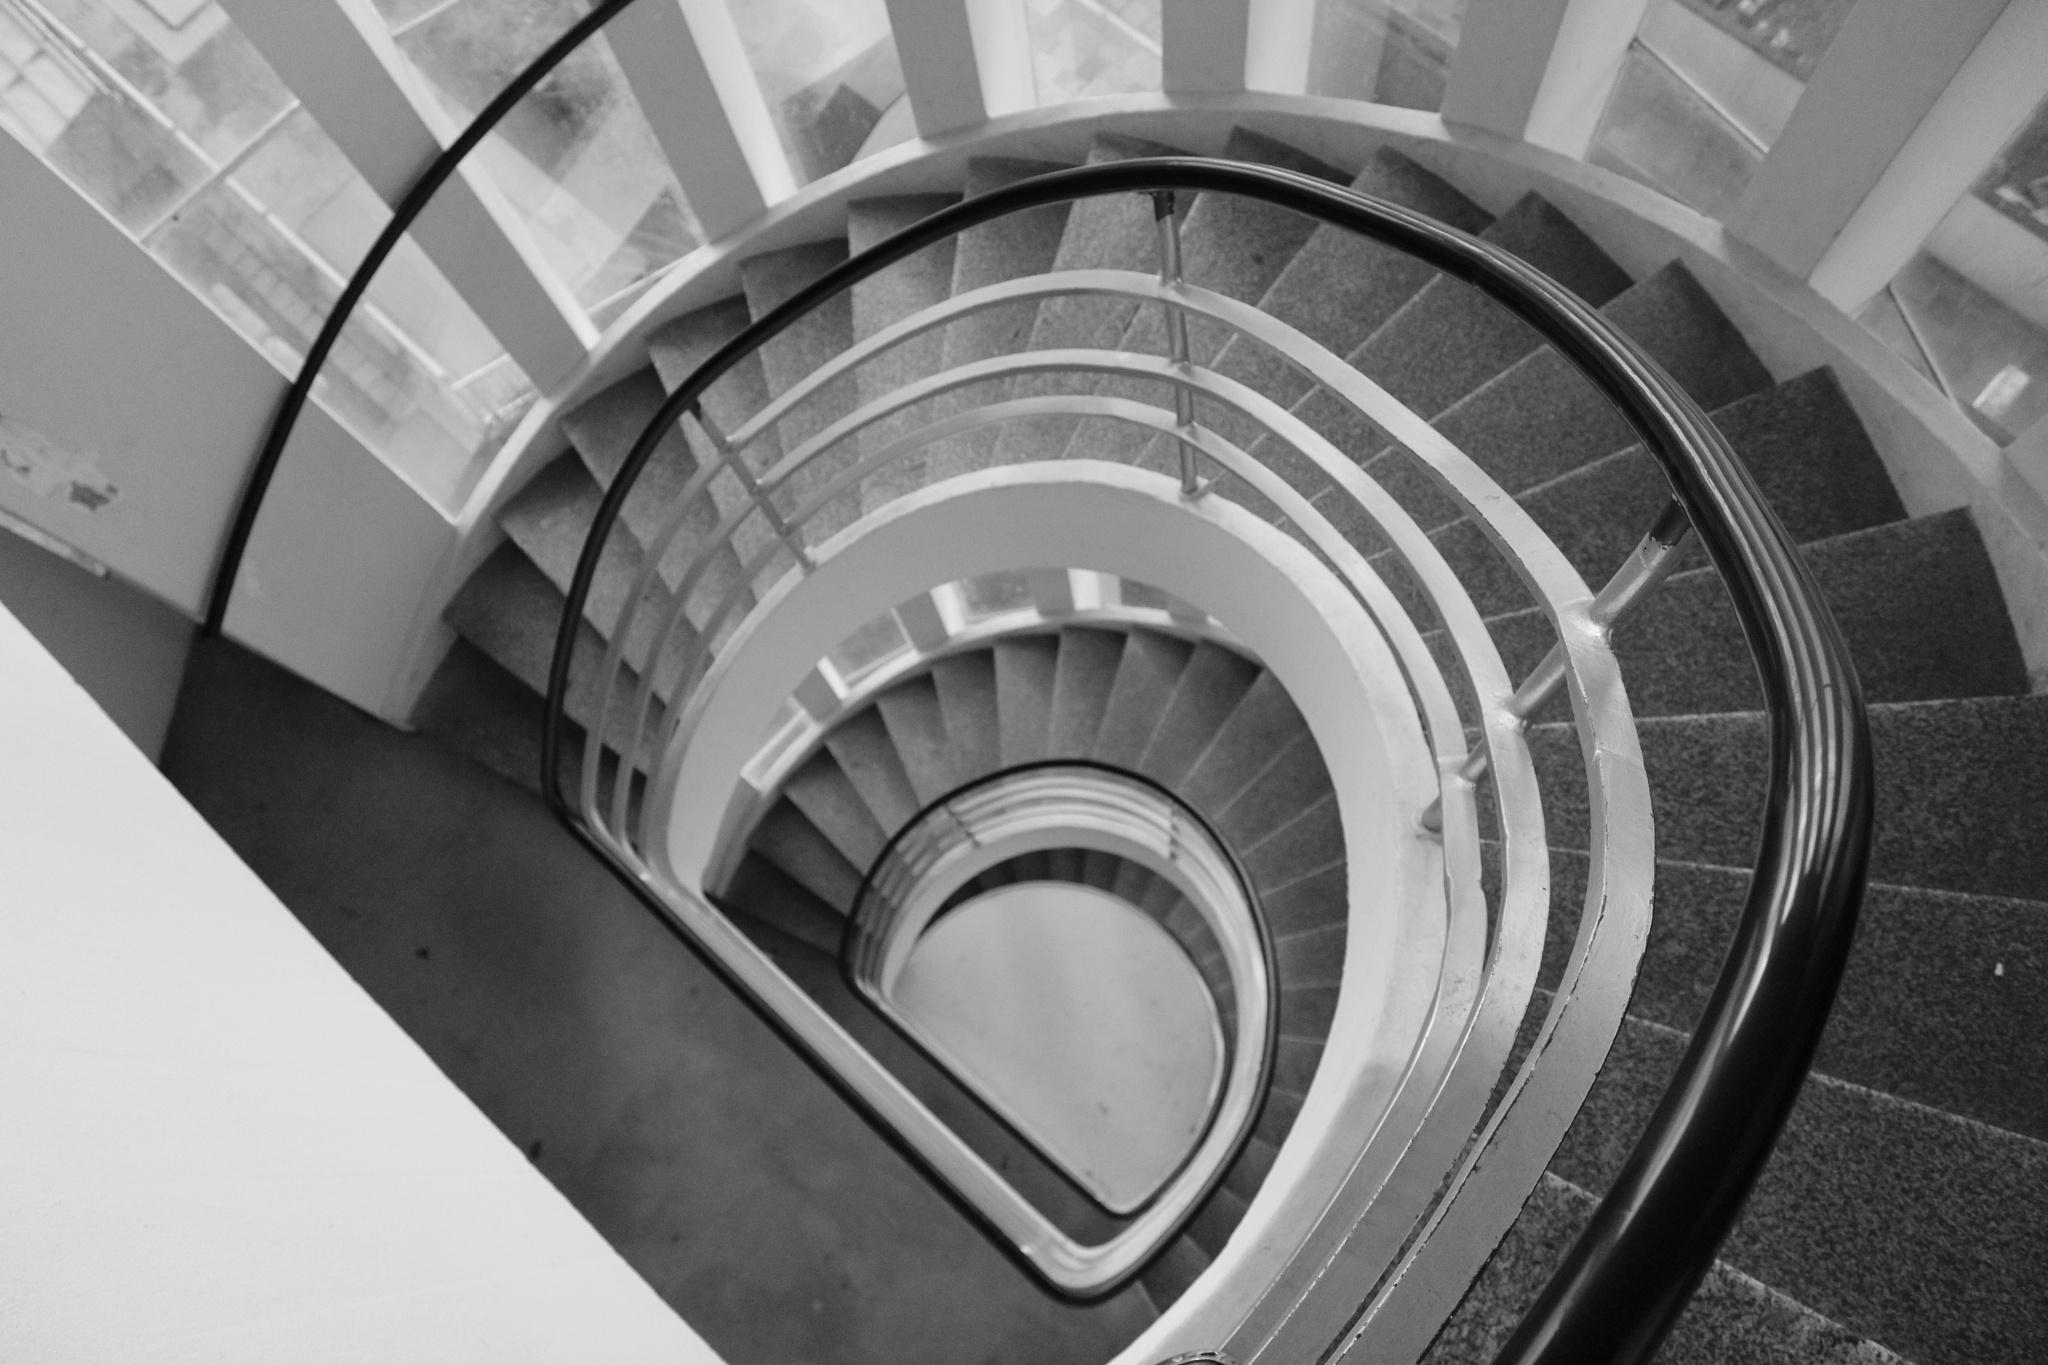 Stairwell by Sietze Buurma